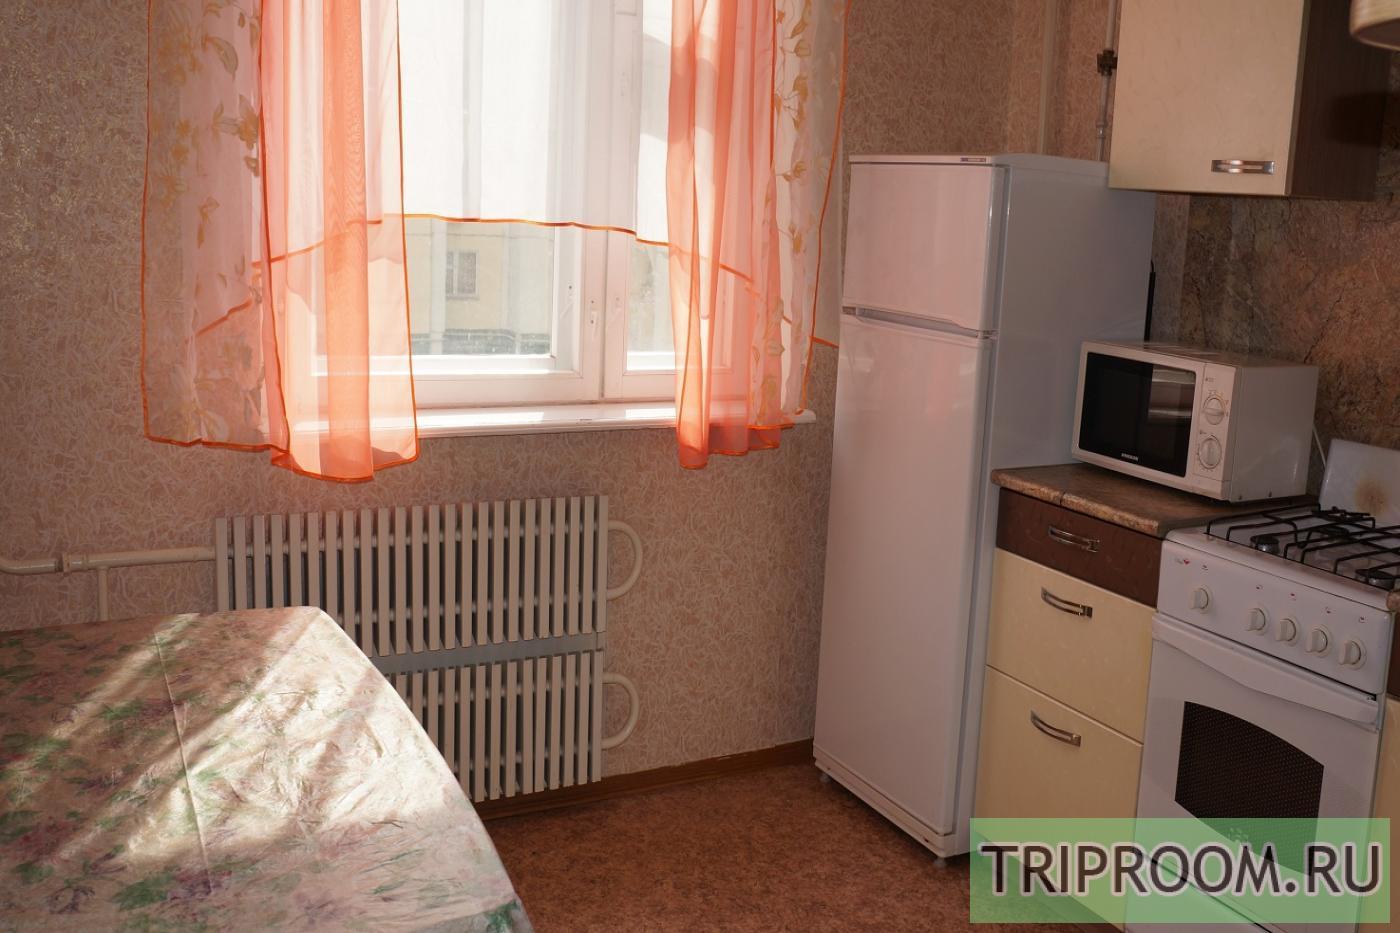 2-комнатная квартира посуточно (вариант № 4710), ул. Ломоносова улица, фото № 2